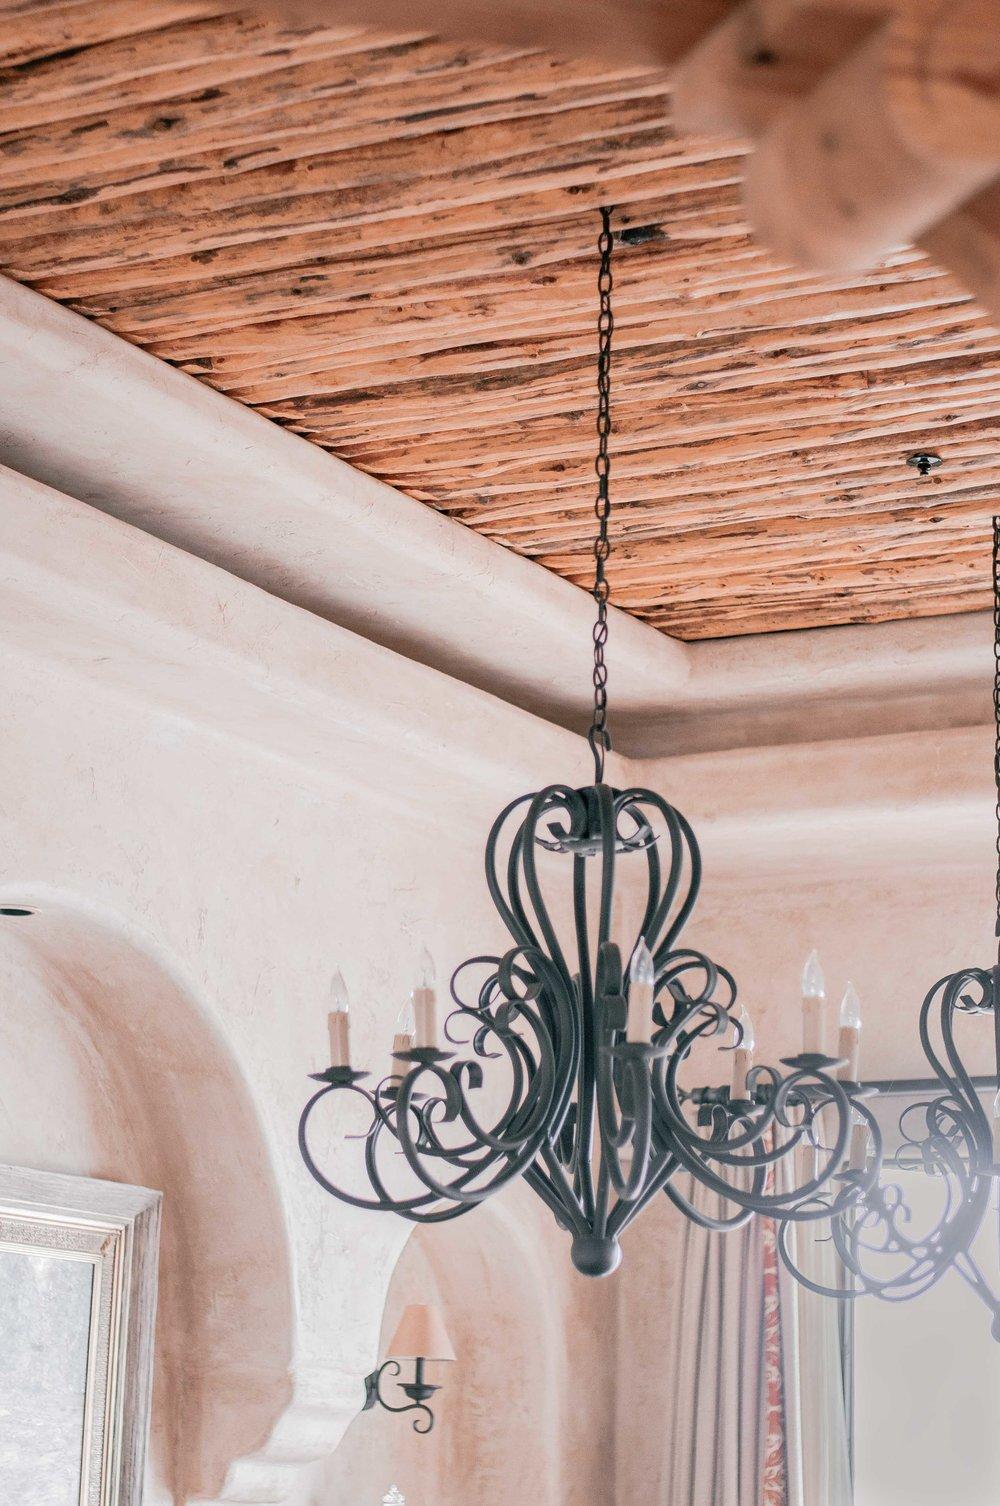 Wood Latillas Ceiling